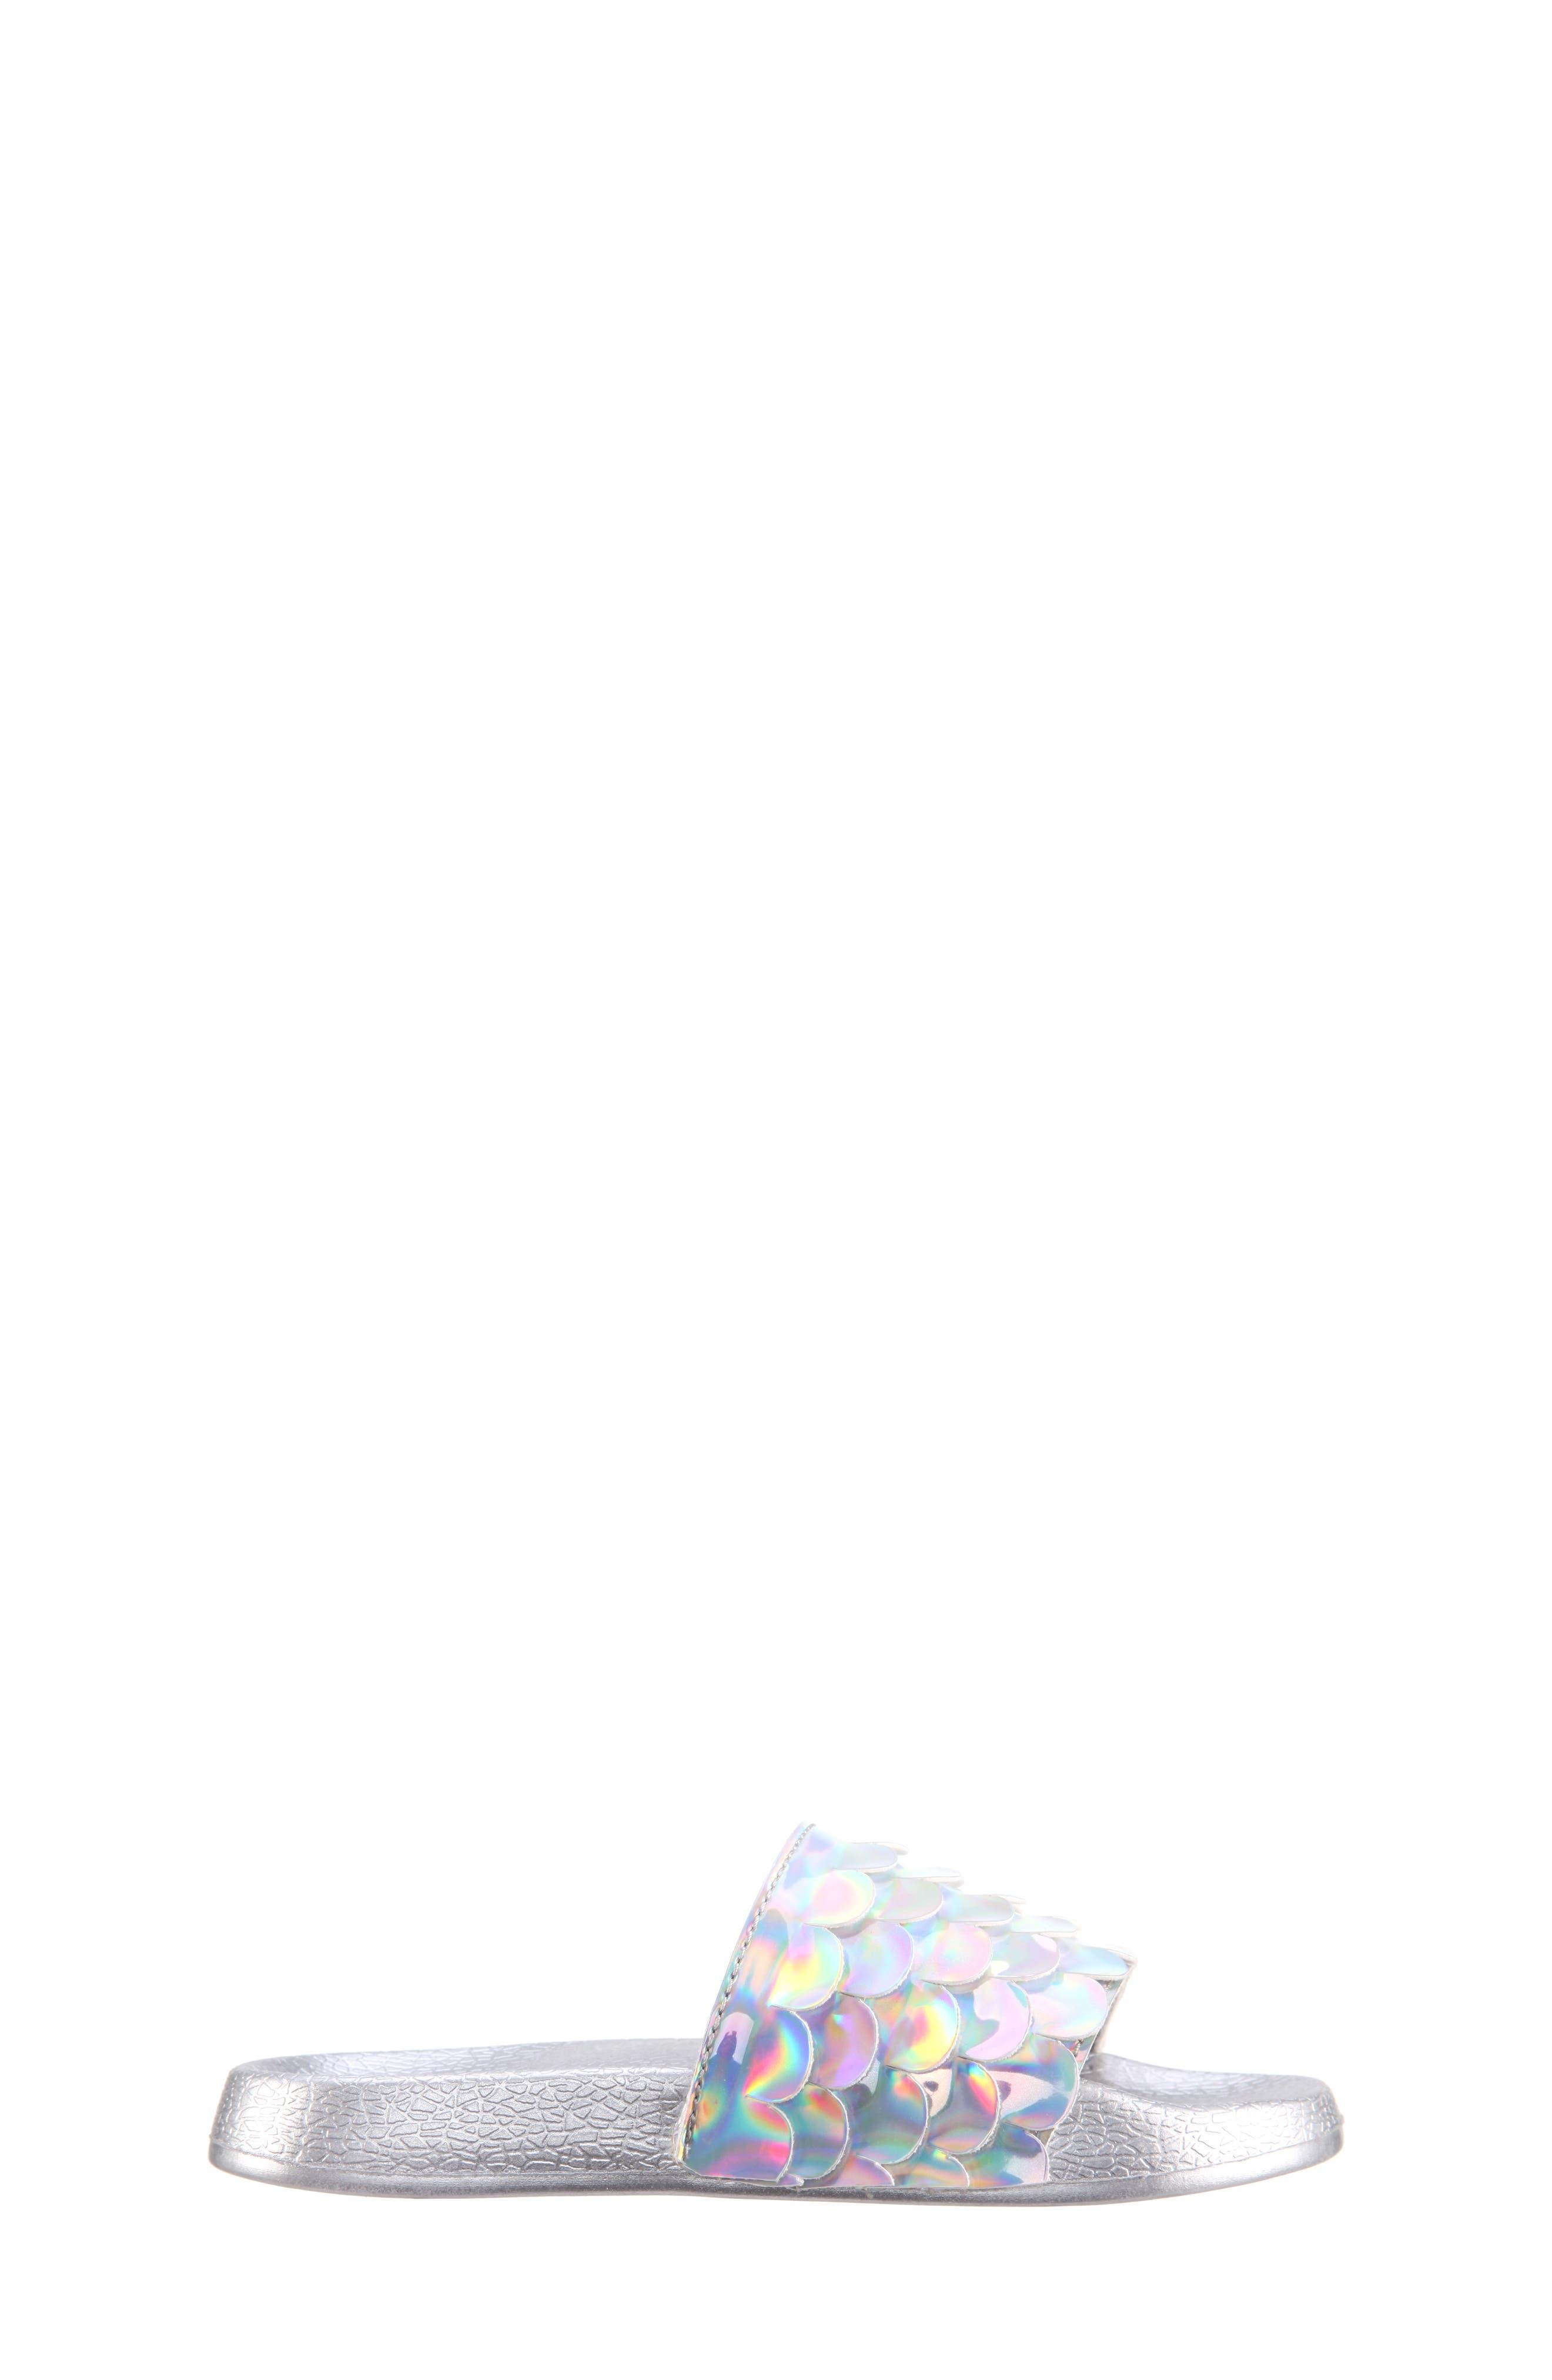 Mermaid Sport Slide Sandal,                             Alternate thumbnail 3, color,                             Silver Mirror Metallic